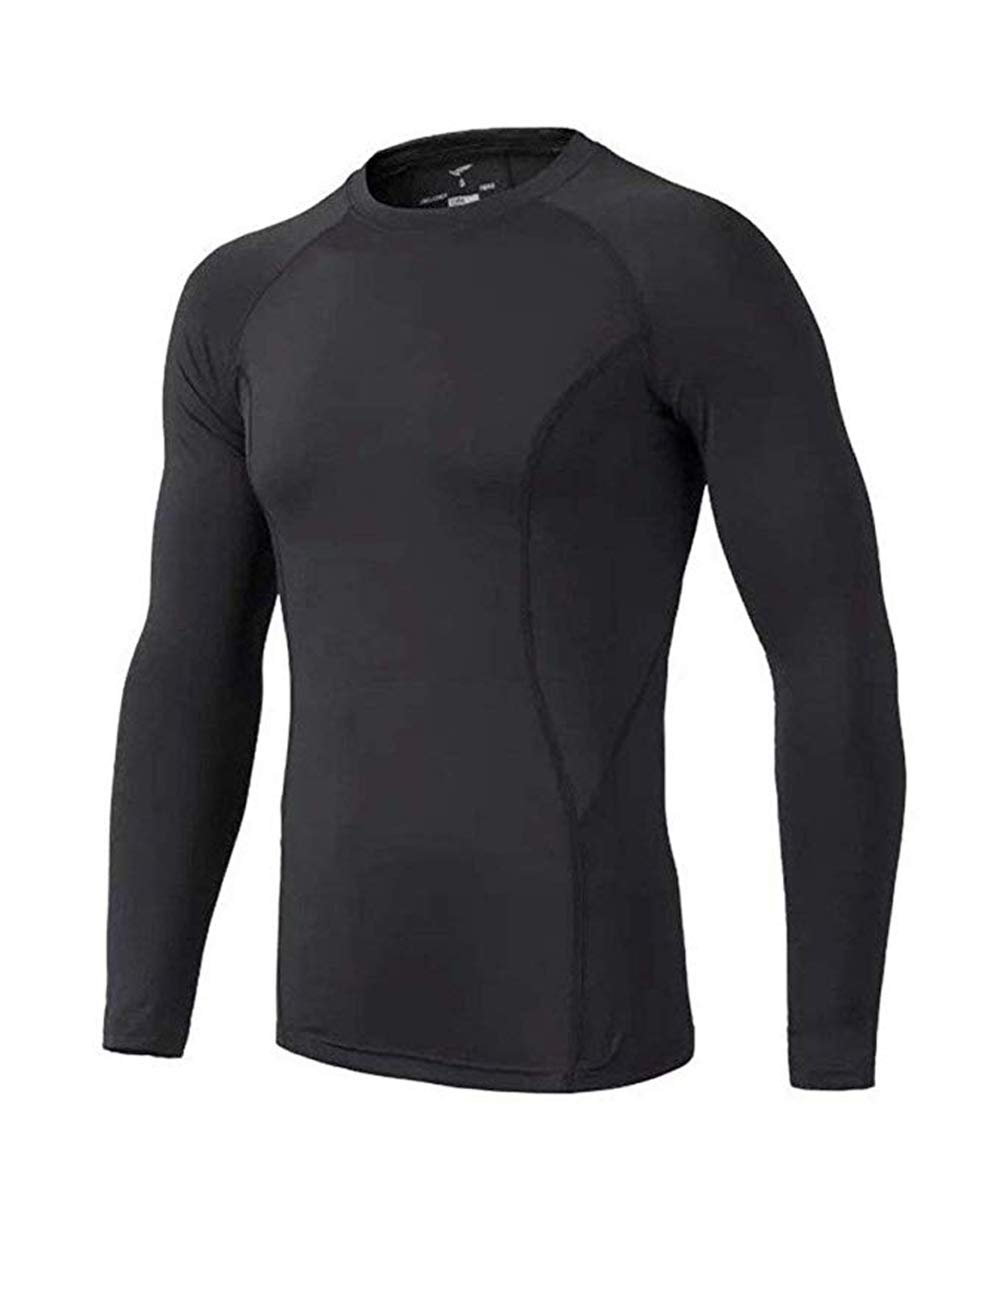 BUYKUD Kids' Boys Long Sleeve Base Layer Compression Underwear Athletic Shirt Tights Top & Bottom Set 2